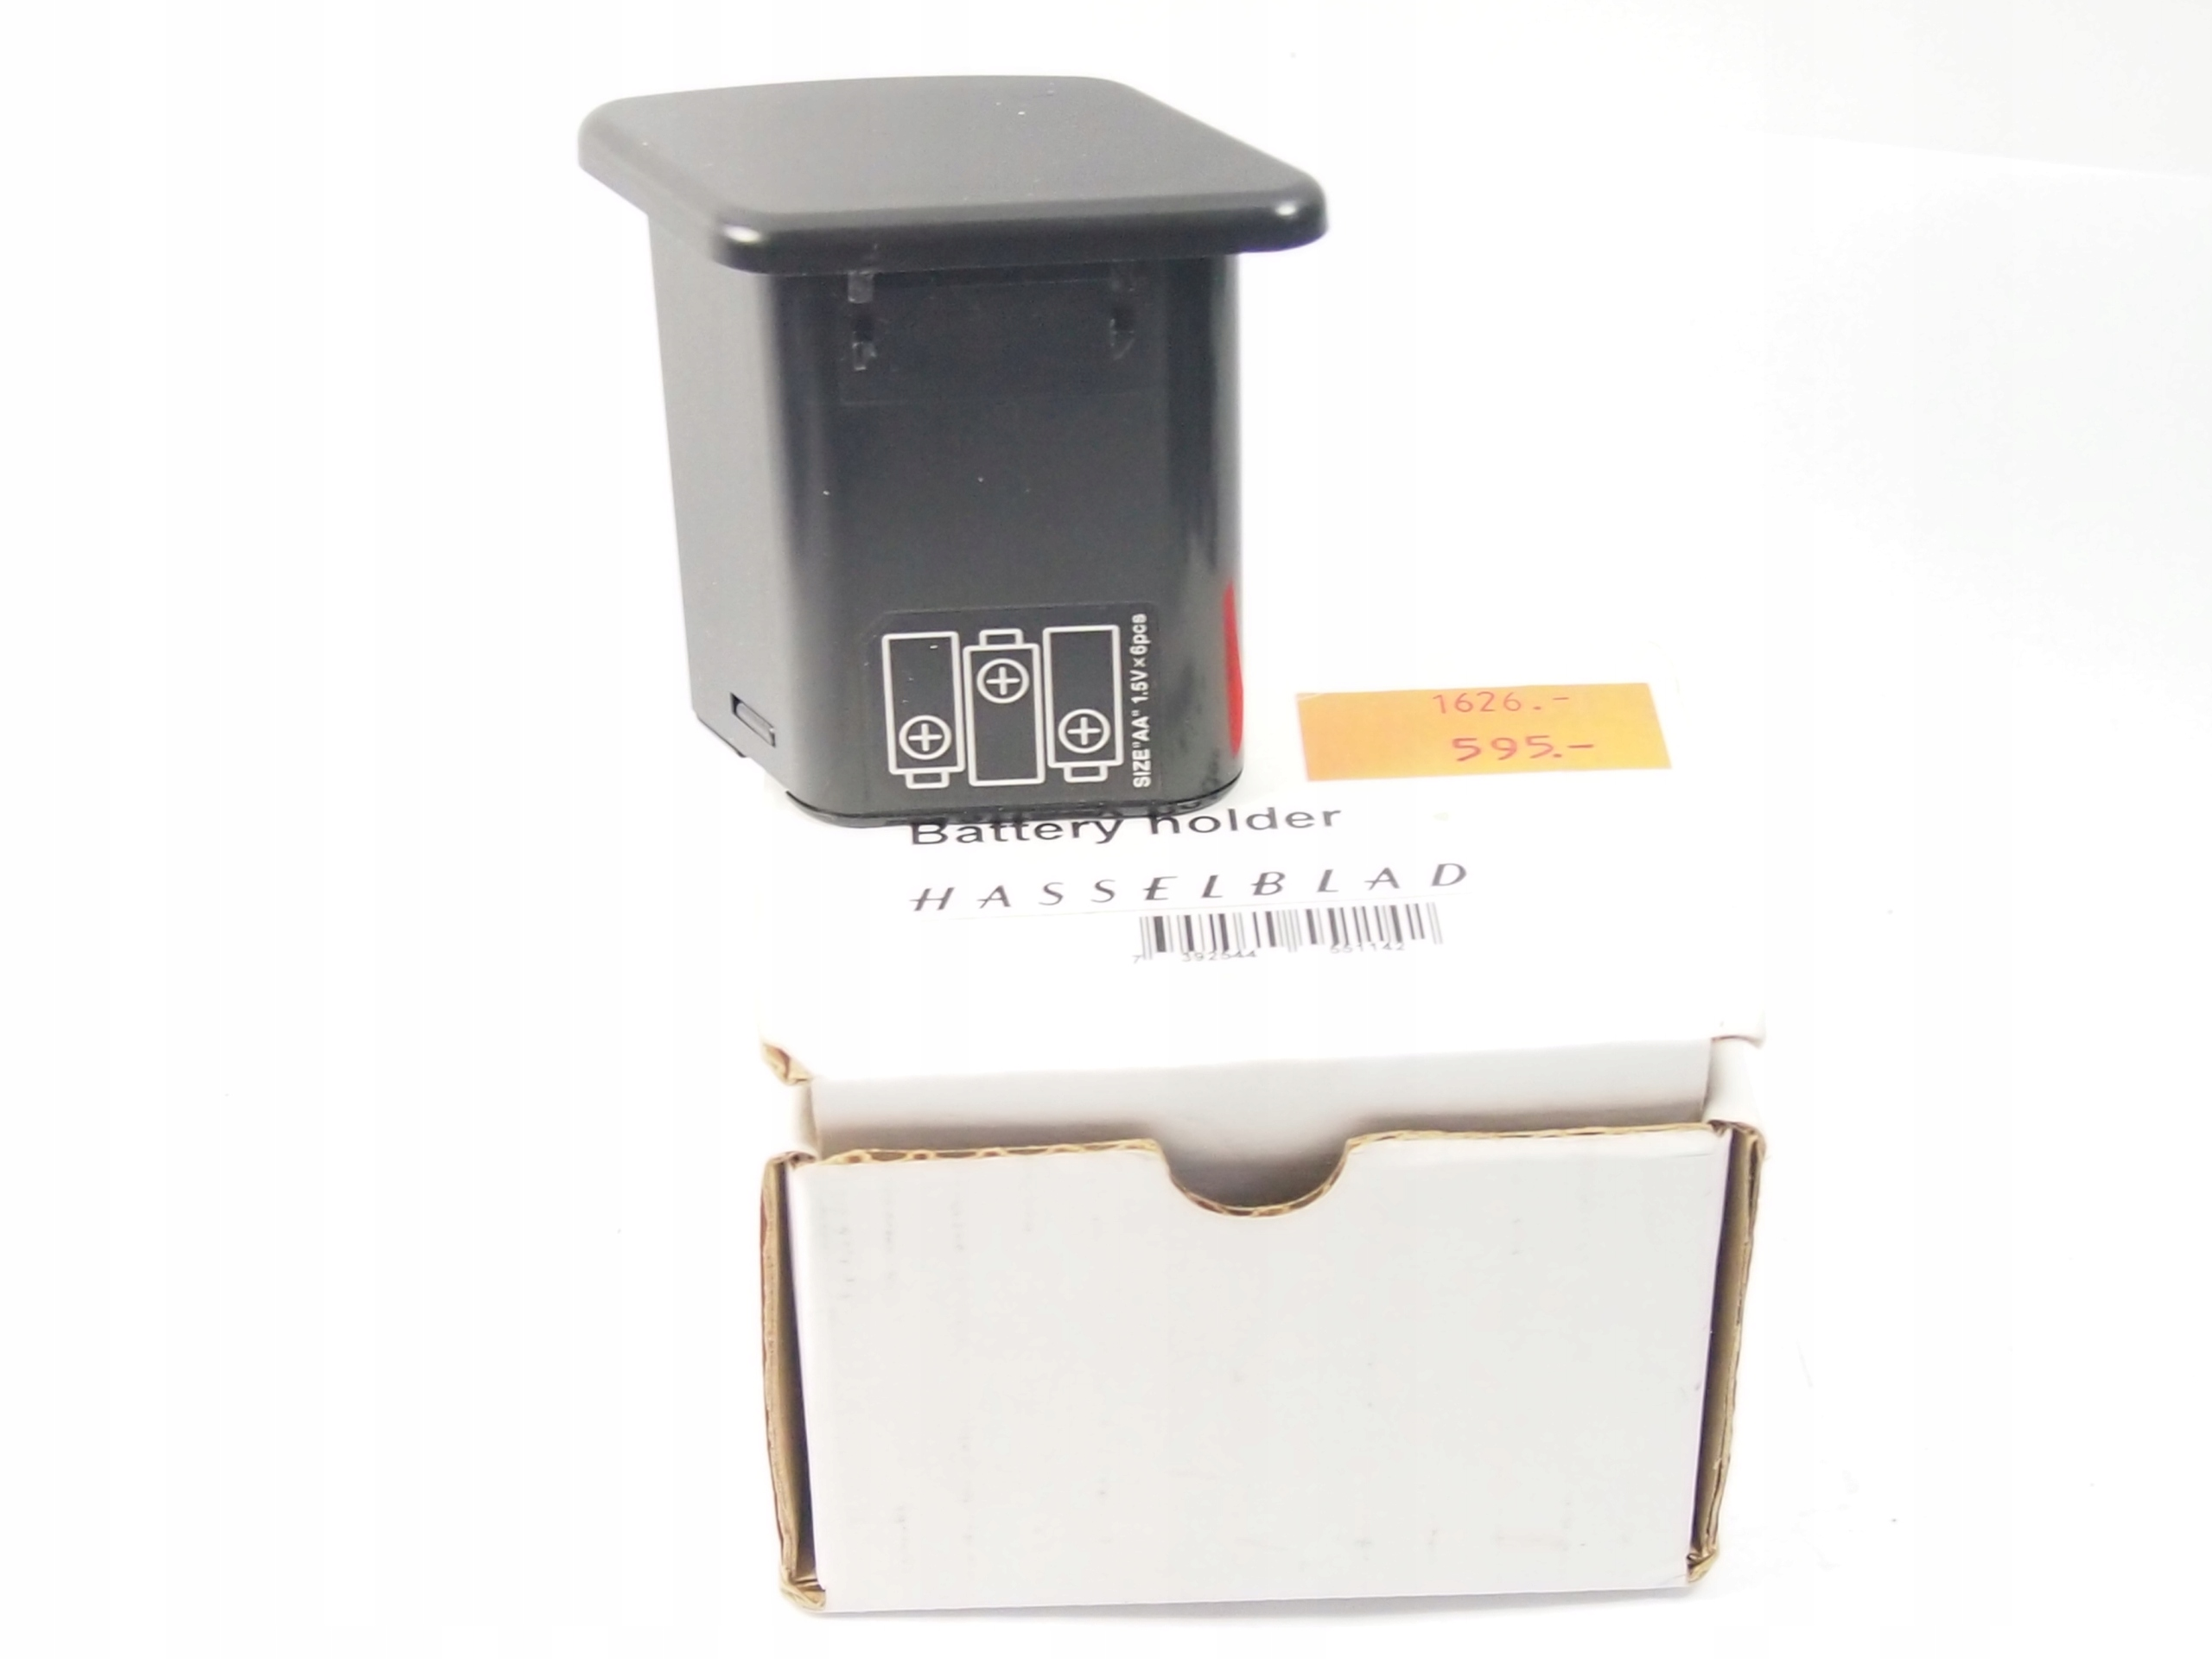 Hasselblad Battery holder pojemnik na baterie